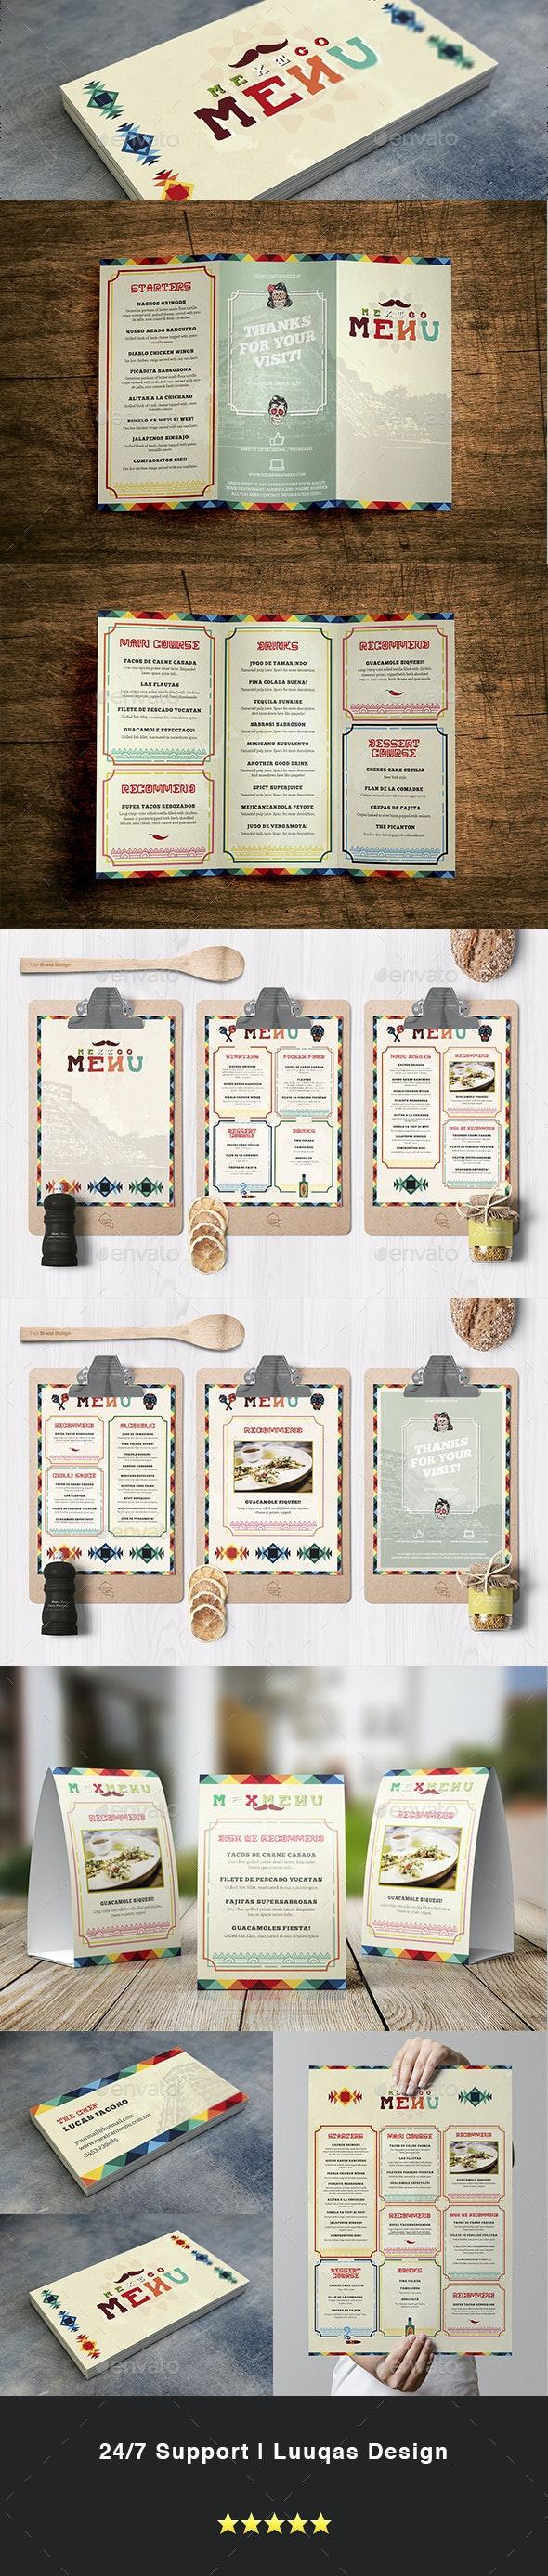 Mexican Food Menu Template - Food Menus Print Templates